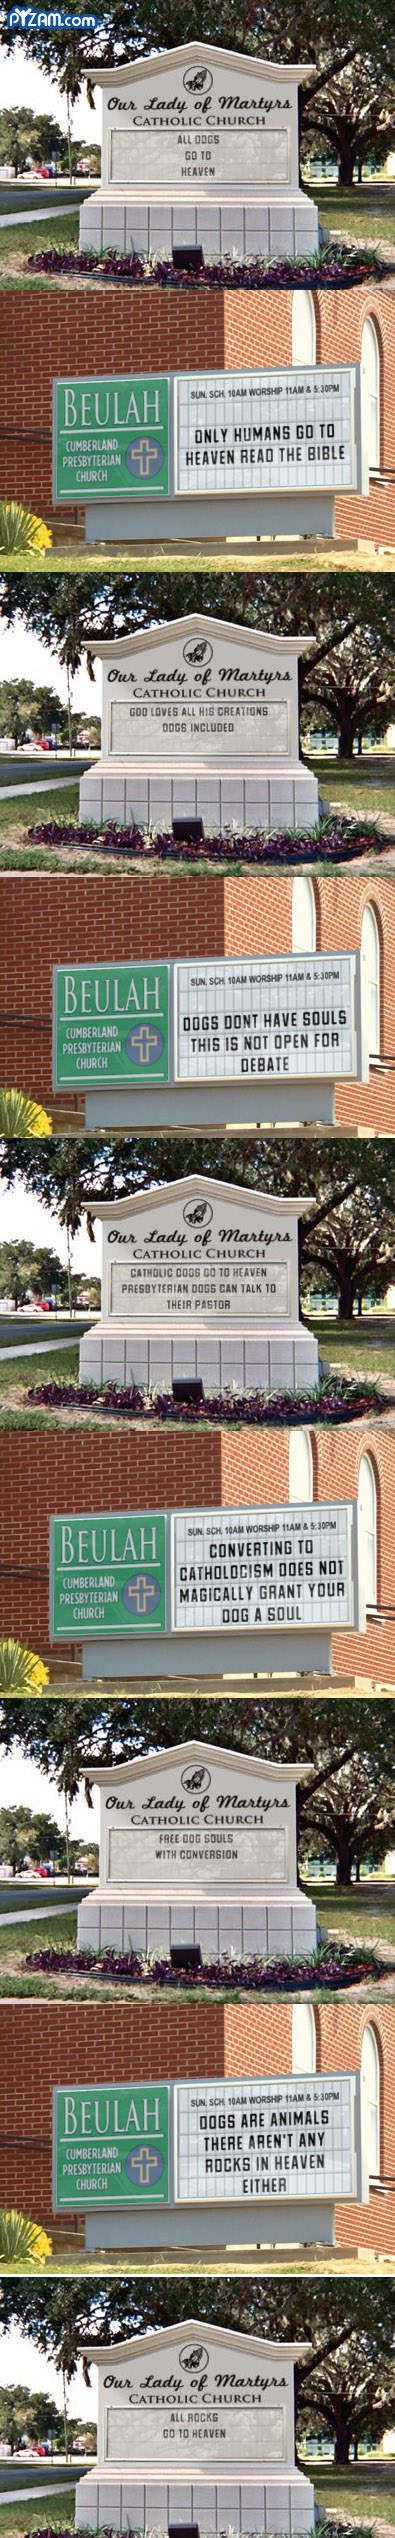 Church Wars...too funny: Make Me Laughing, Dogs, Church Signs, Too Funny, Catholic Church, So Funny, Rocks, Church Humor, Heavens